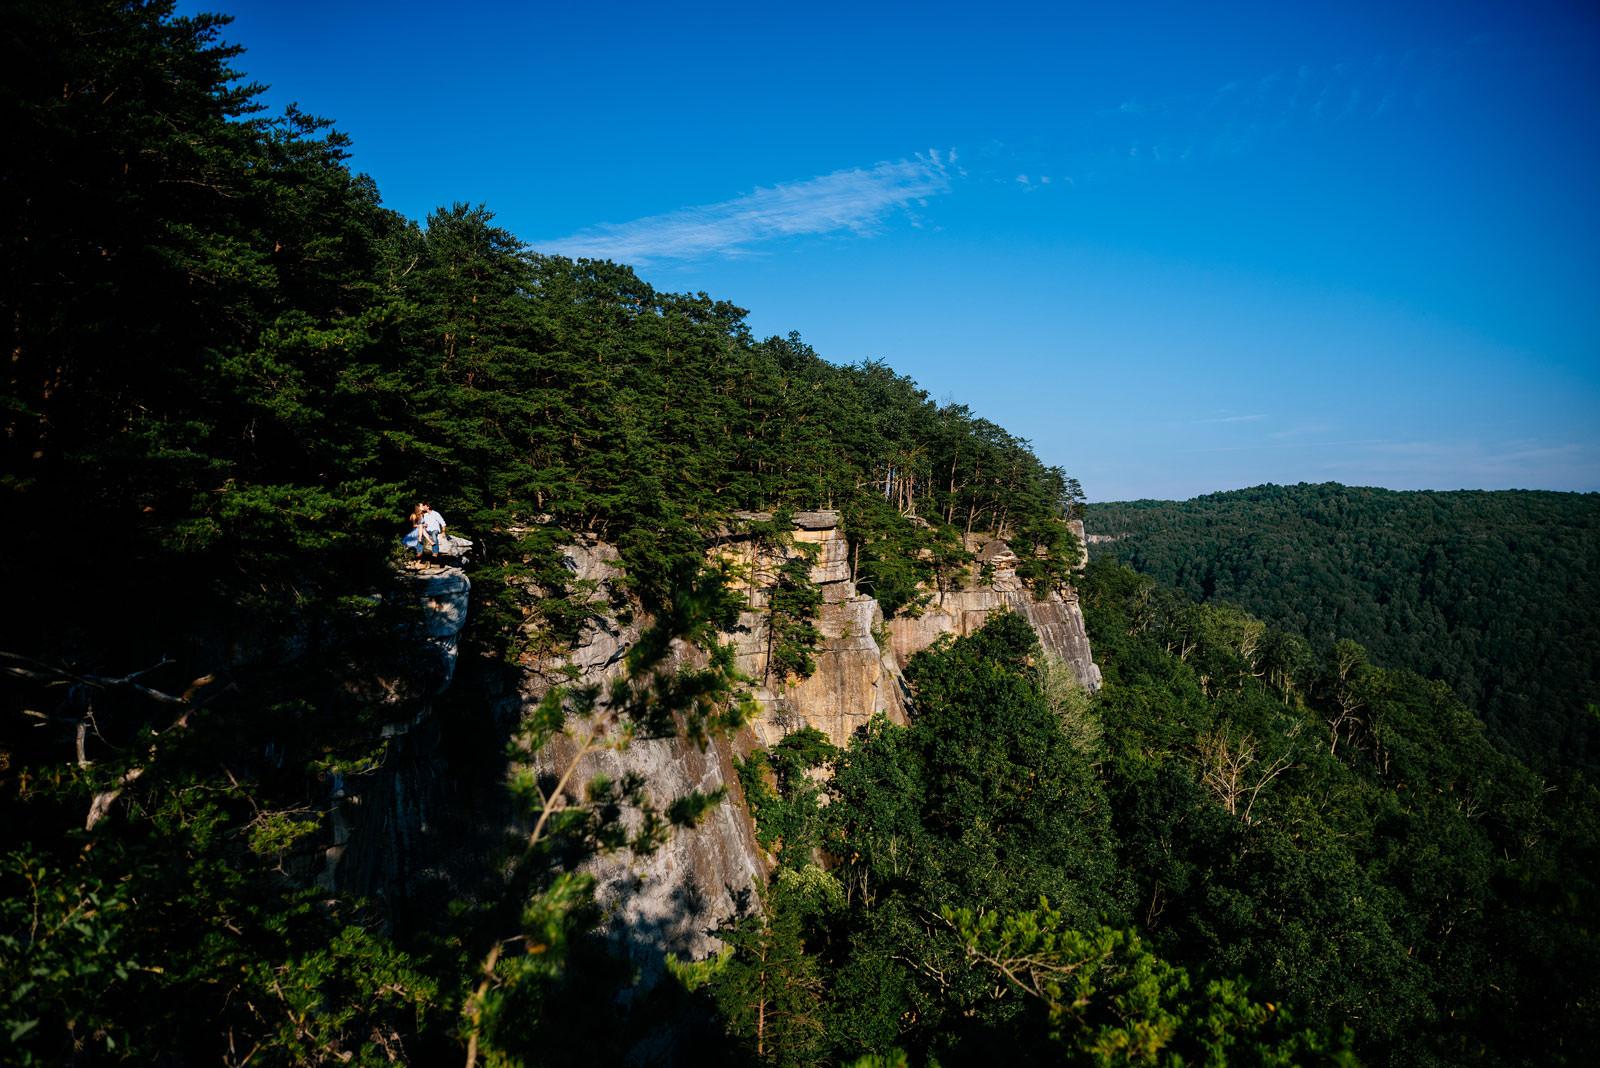 fayetteville wv hiking engagement